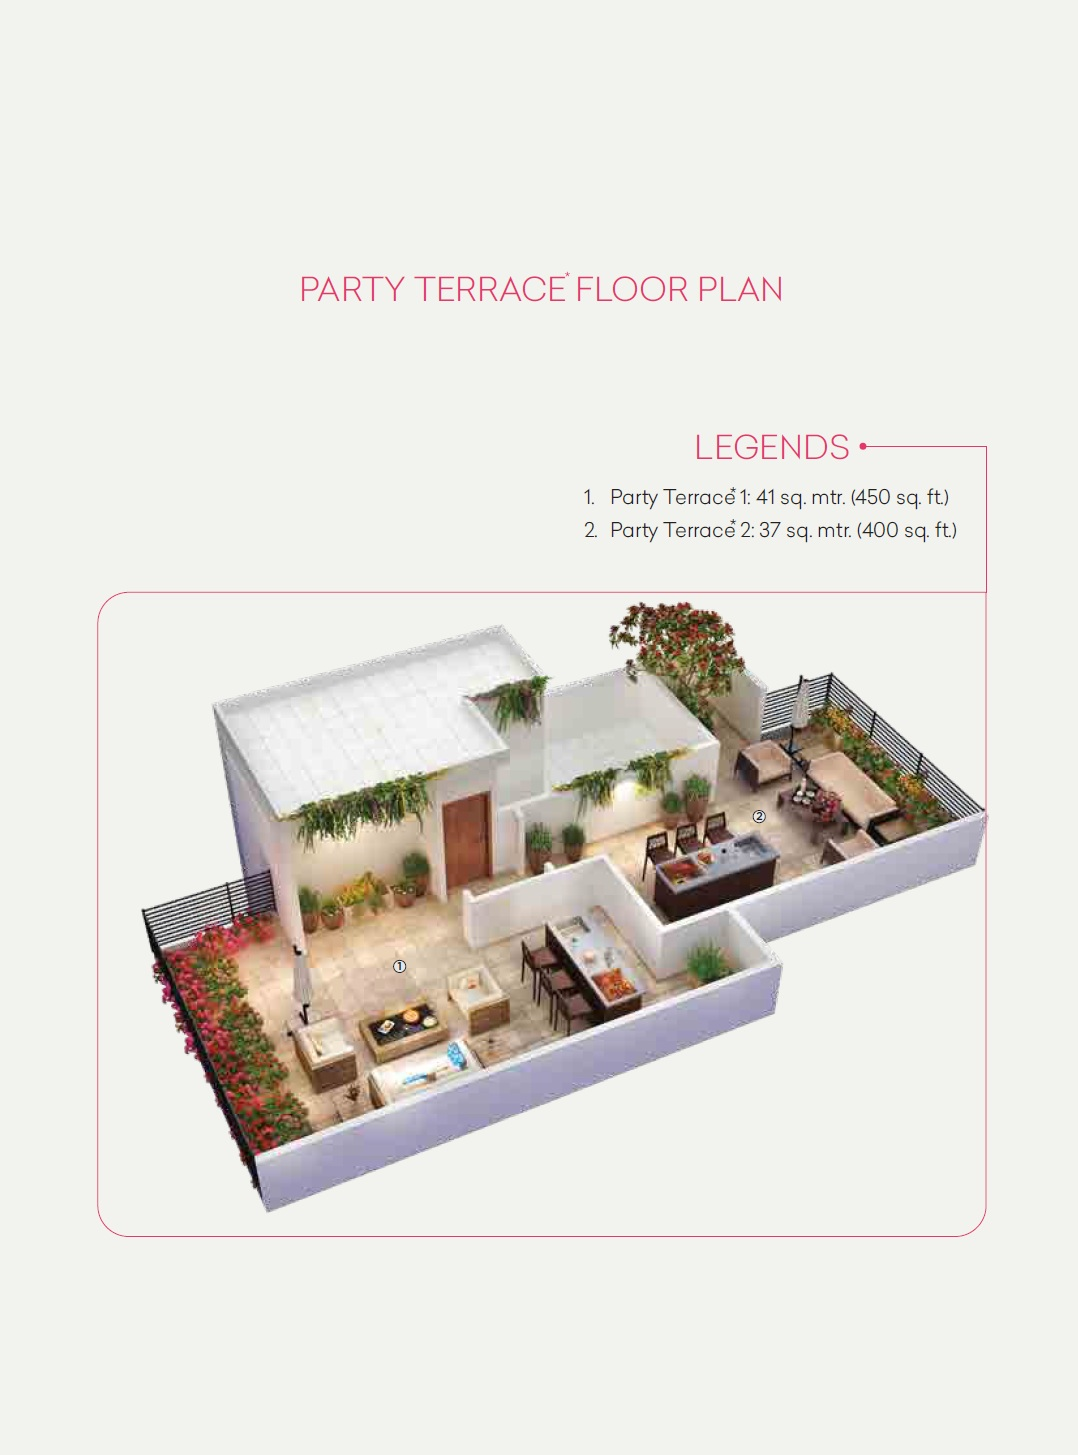 CERISE FLOORS, CENTRAL PARK, FLOWER VALLEY, SOHNA